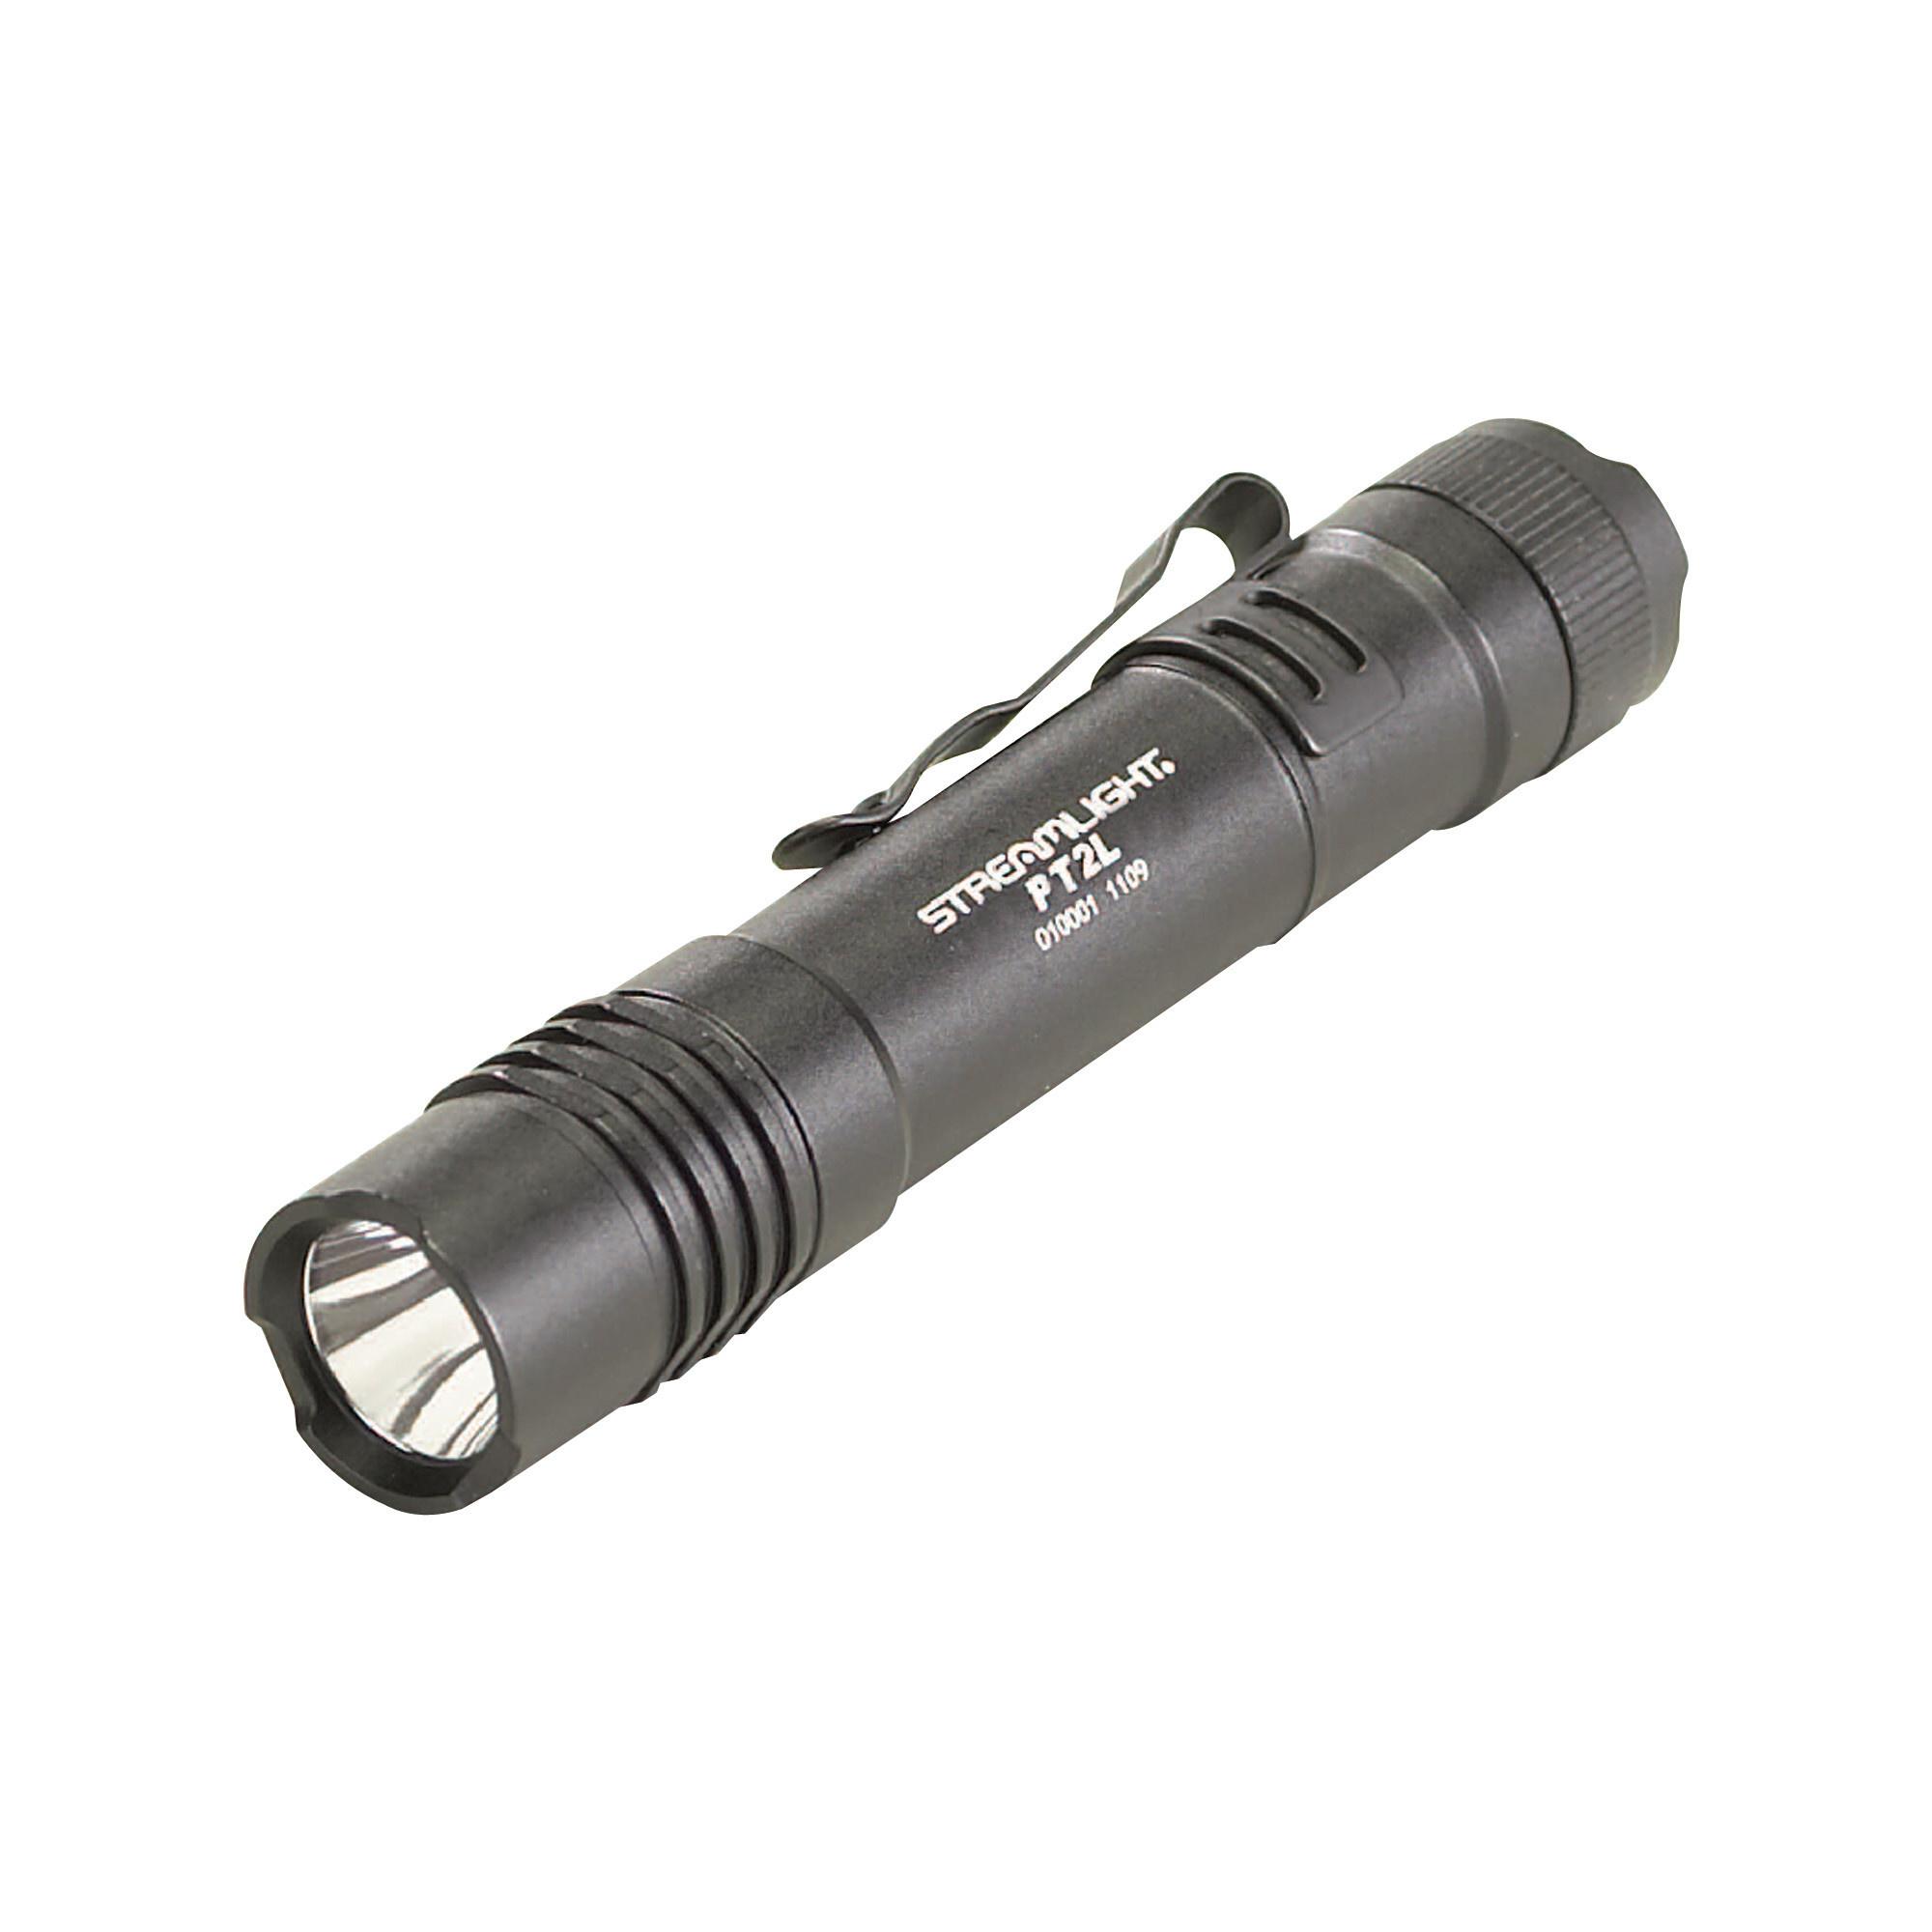 STREAMLIGHT, INC. Streamlight PROTAC 2L LED